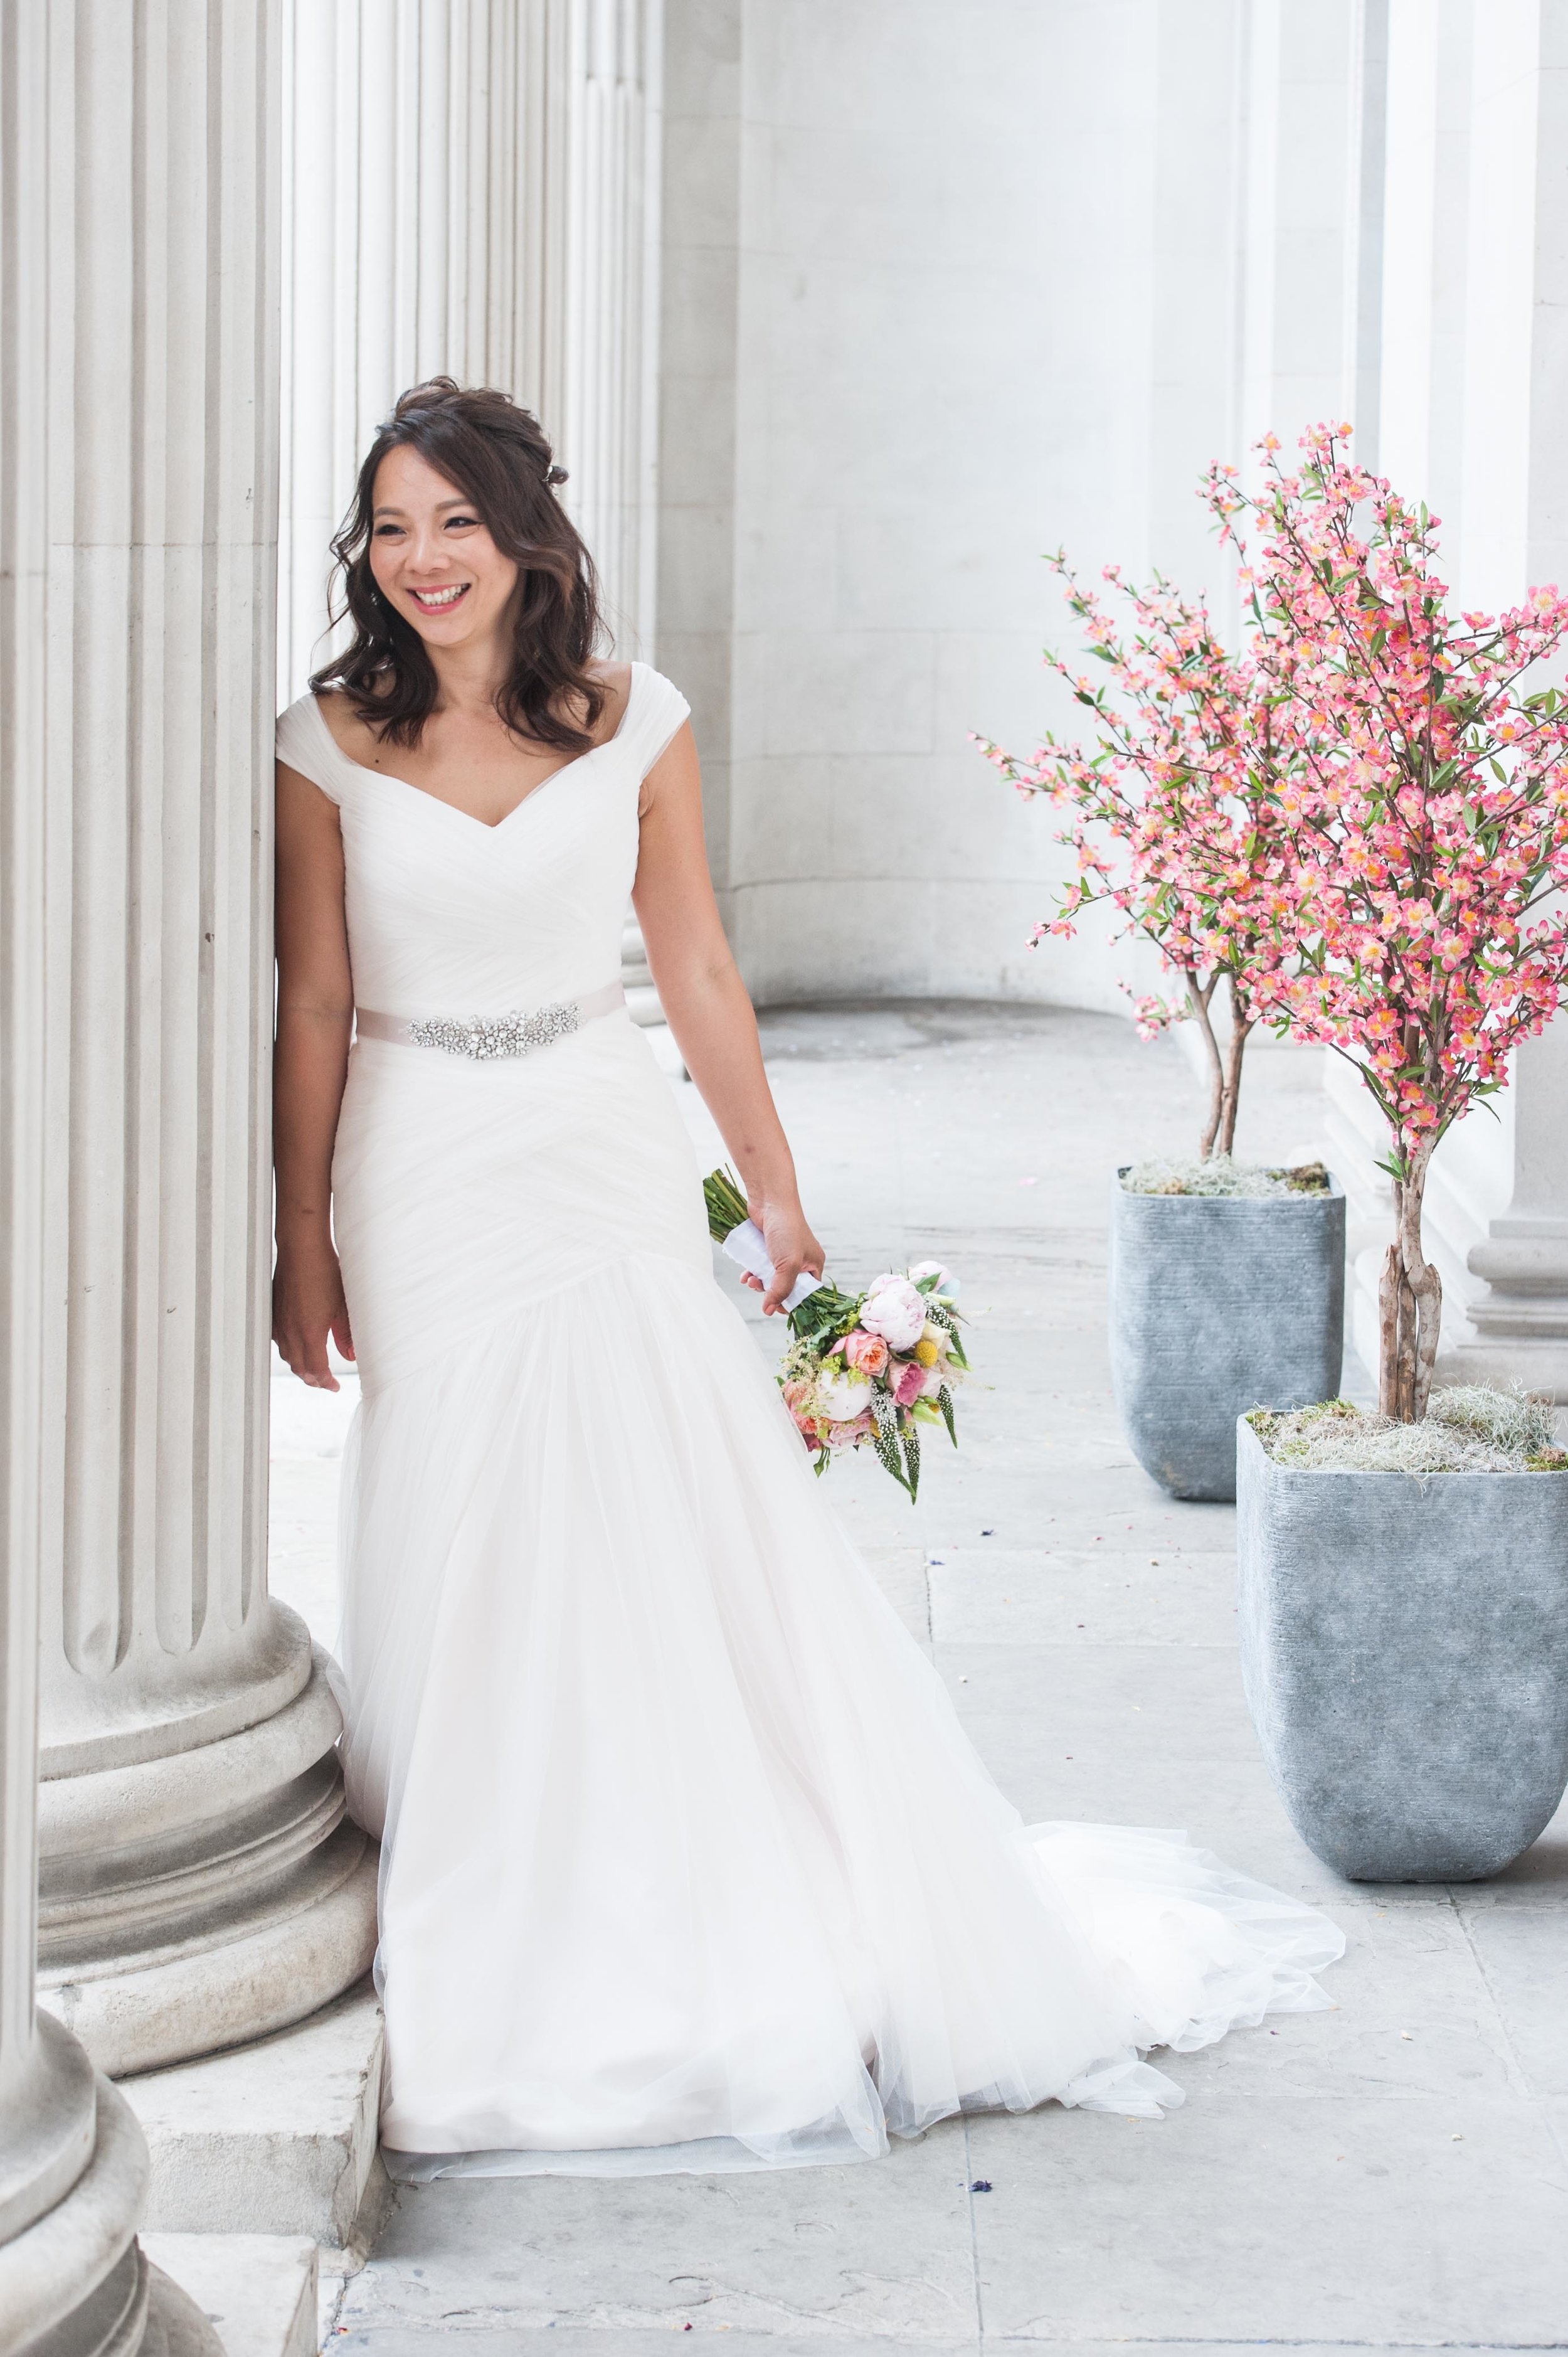 D&M_Marylebone Town Hall Wedding (53 of 239).jpg